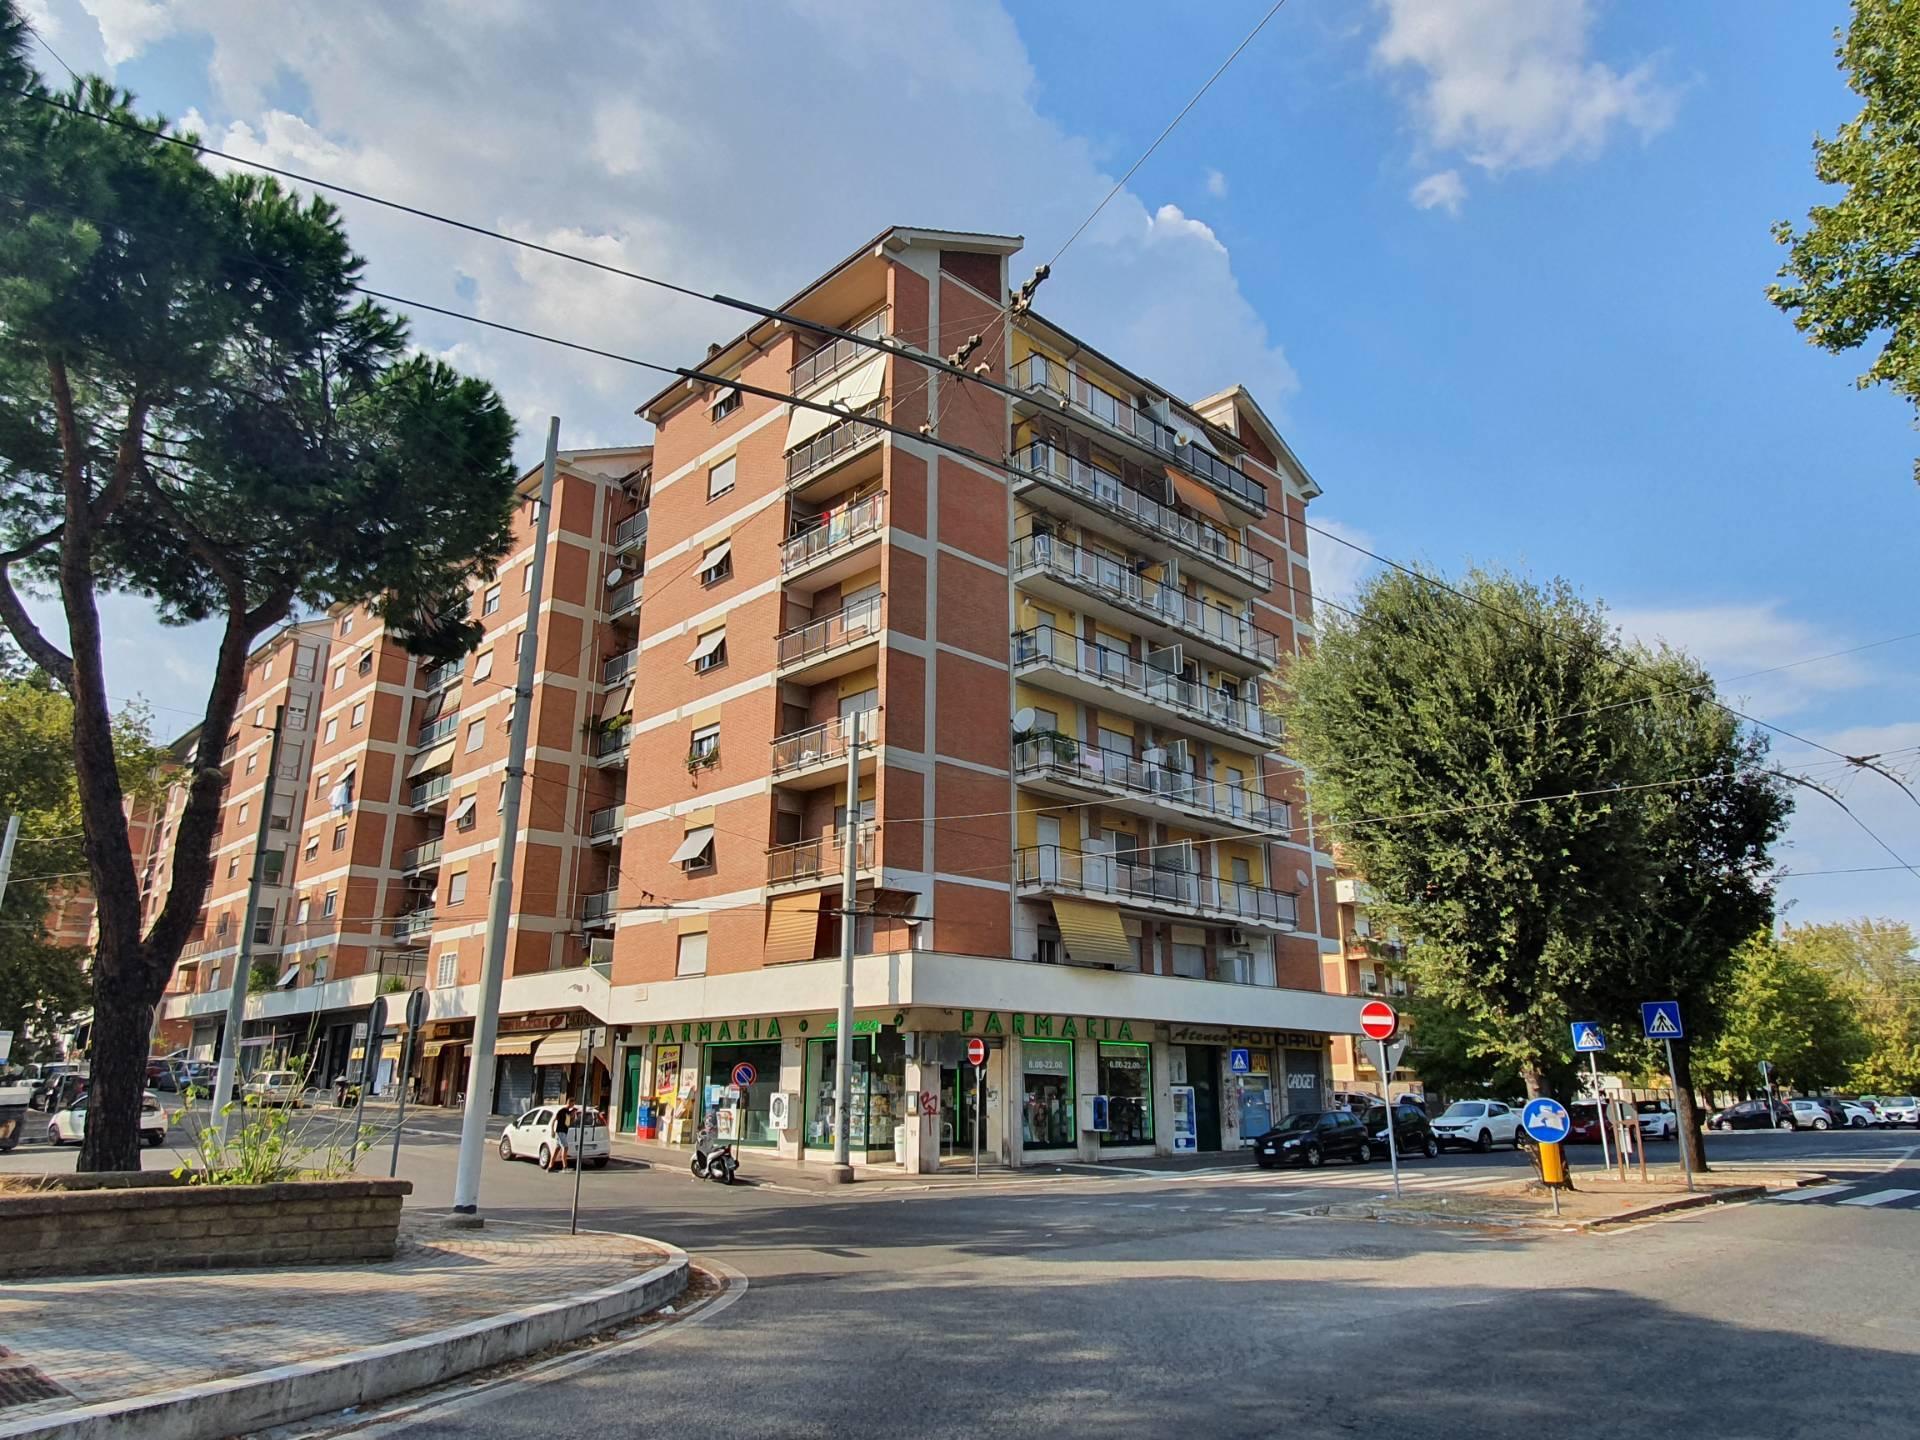 1118417968 Bilocale in Via Rodolfo Morandi, Roma, Zona Nuovo Salario